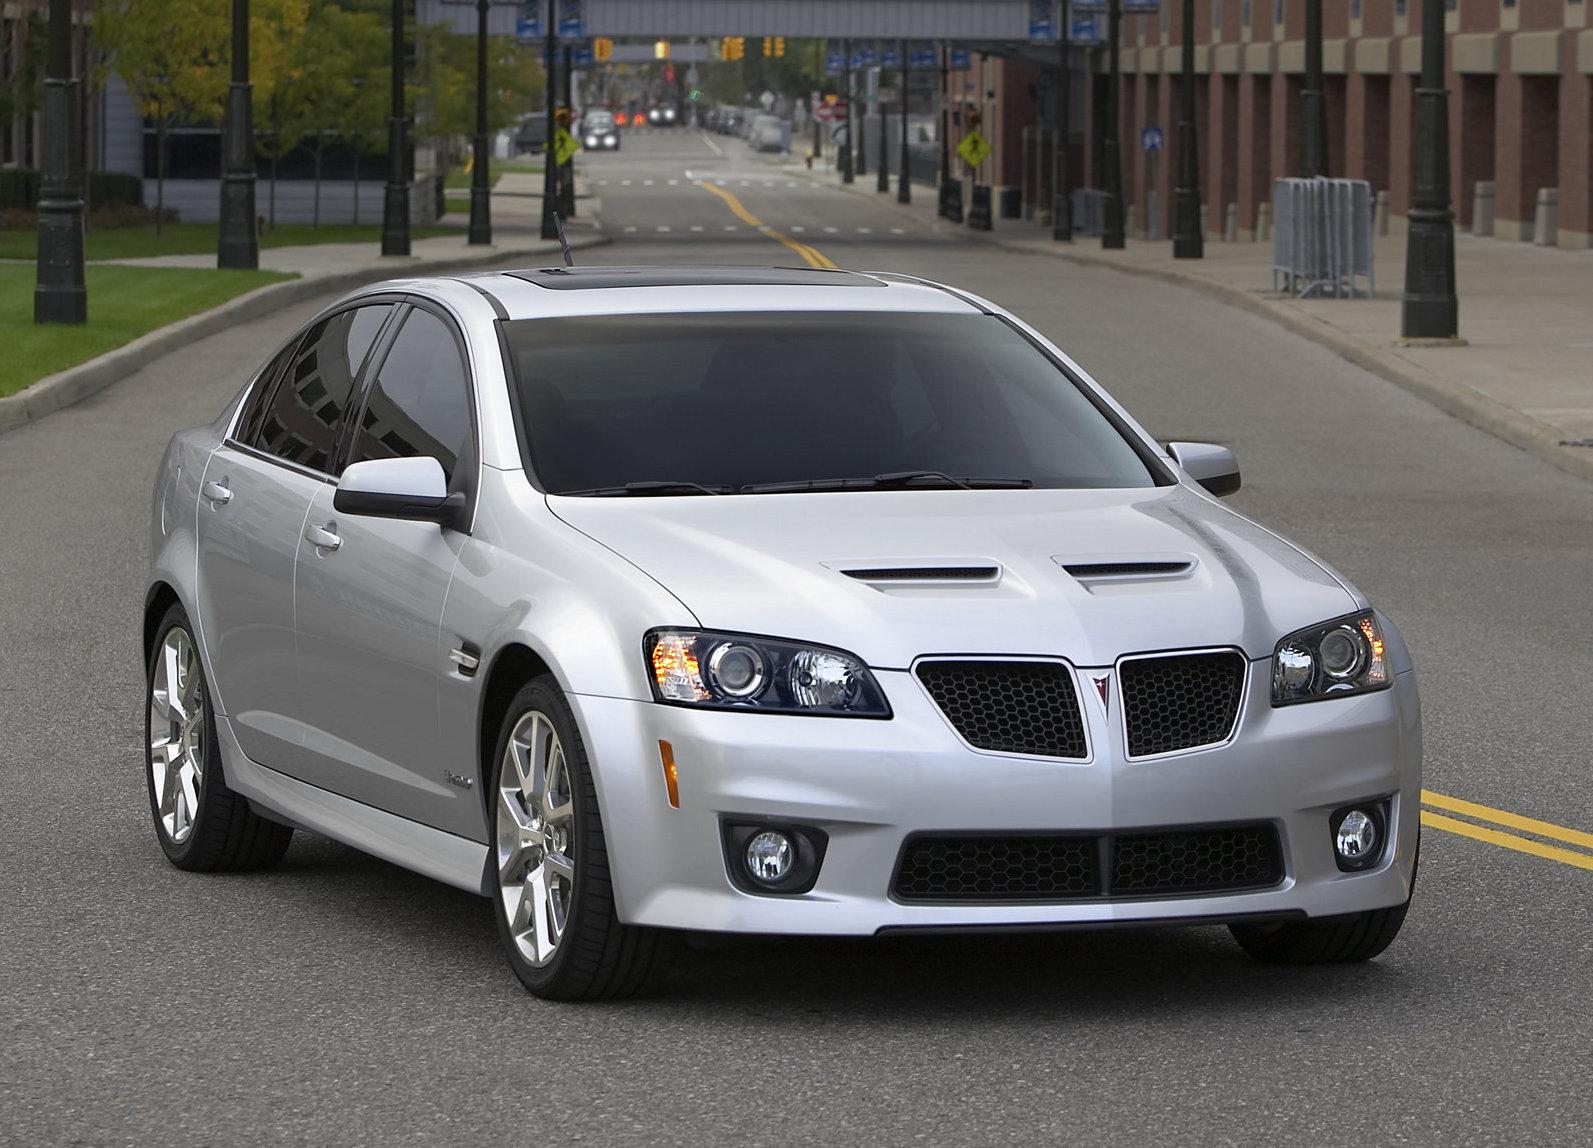 2000 Pontiac G8 GXP